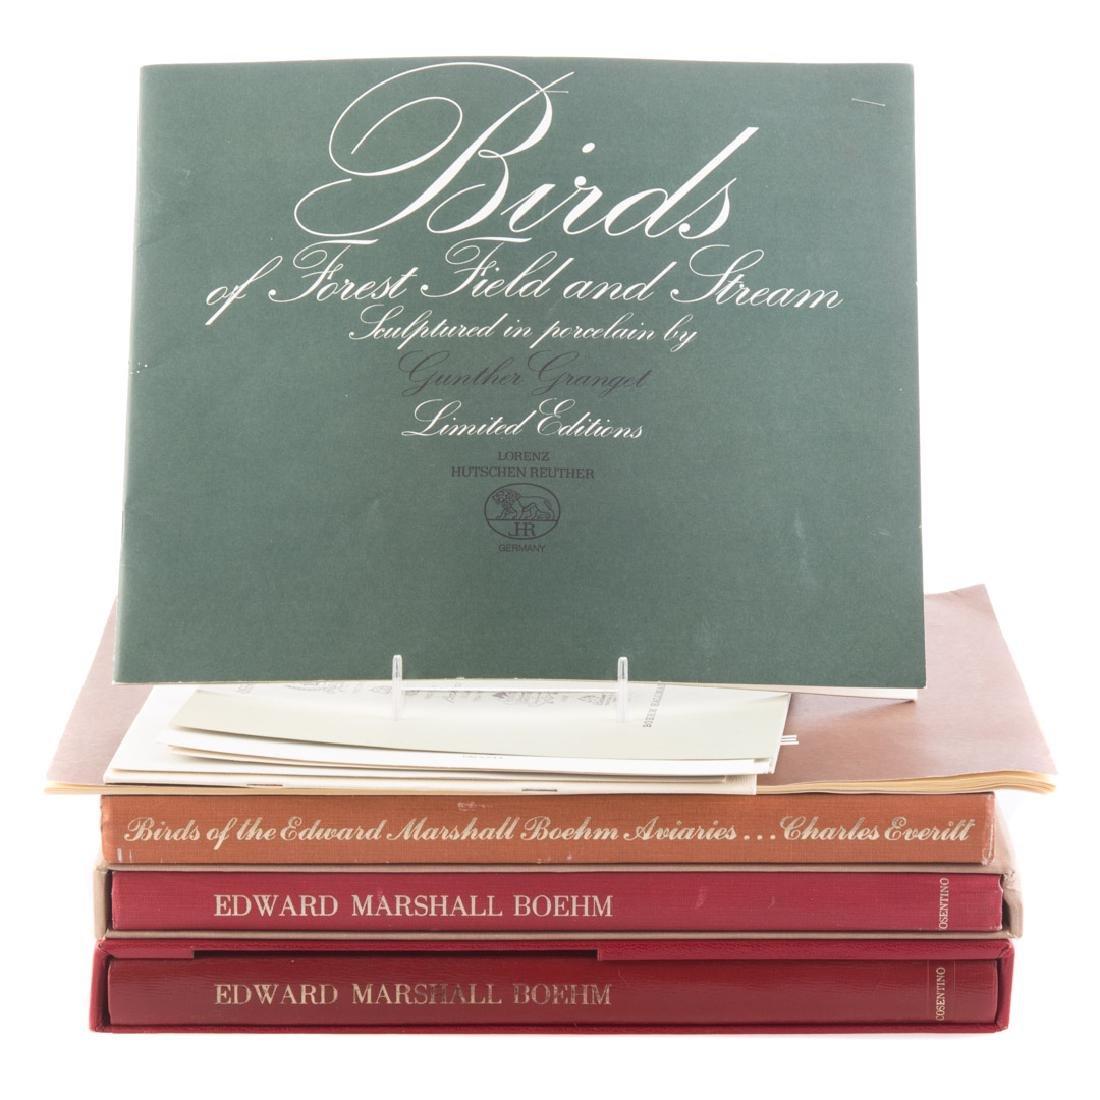 Three books on Edward Marshall Boehm